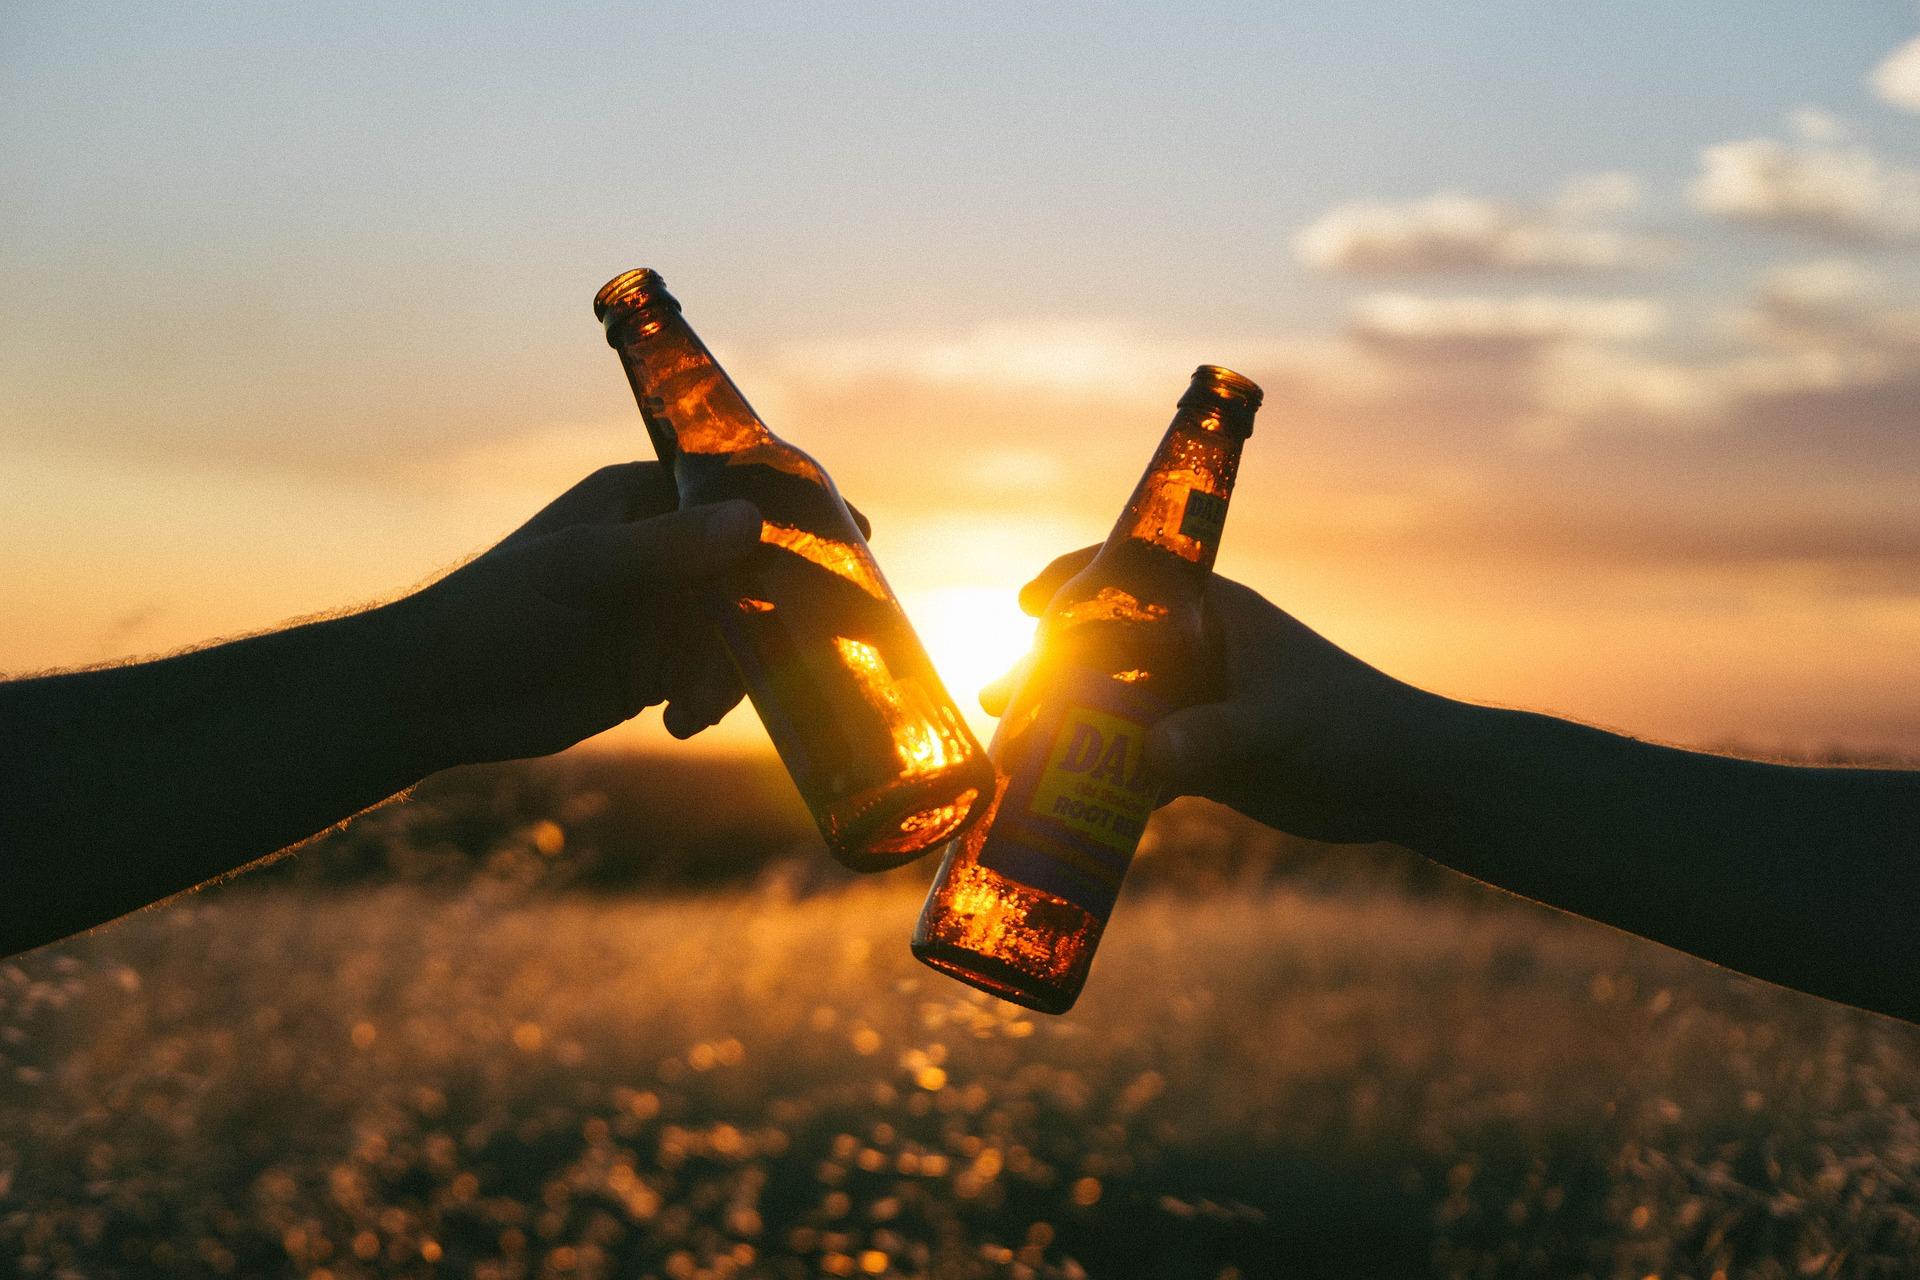 Brinde, amizade, cerveja, casal, Relaxe - Papéis de parede HD - Professor-falken.com